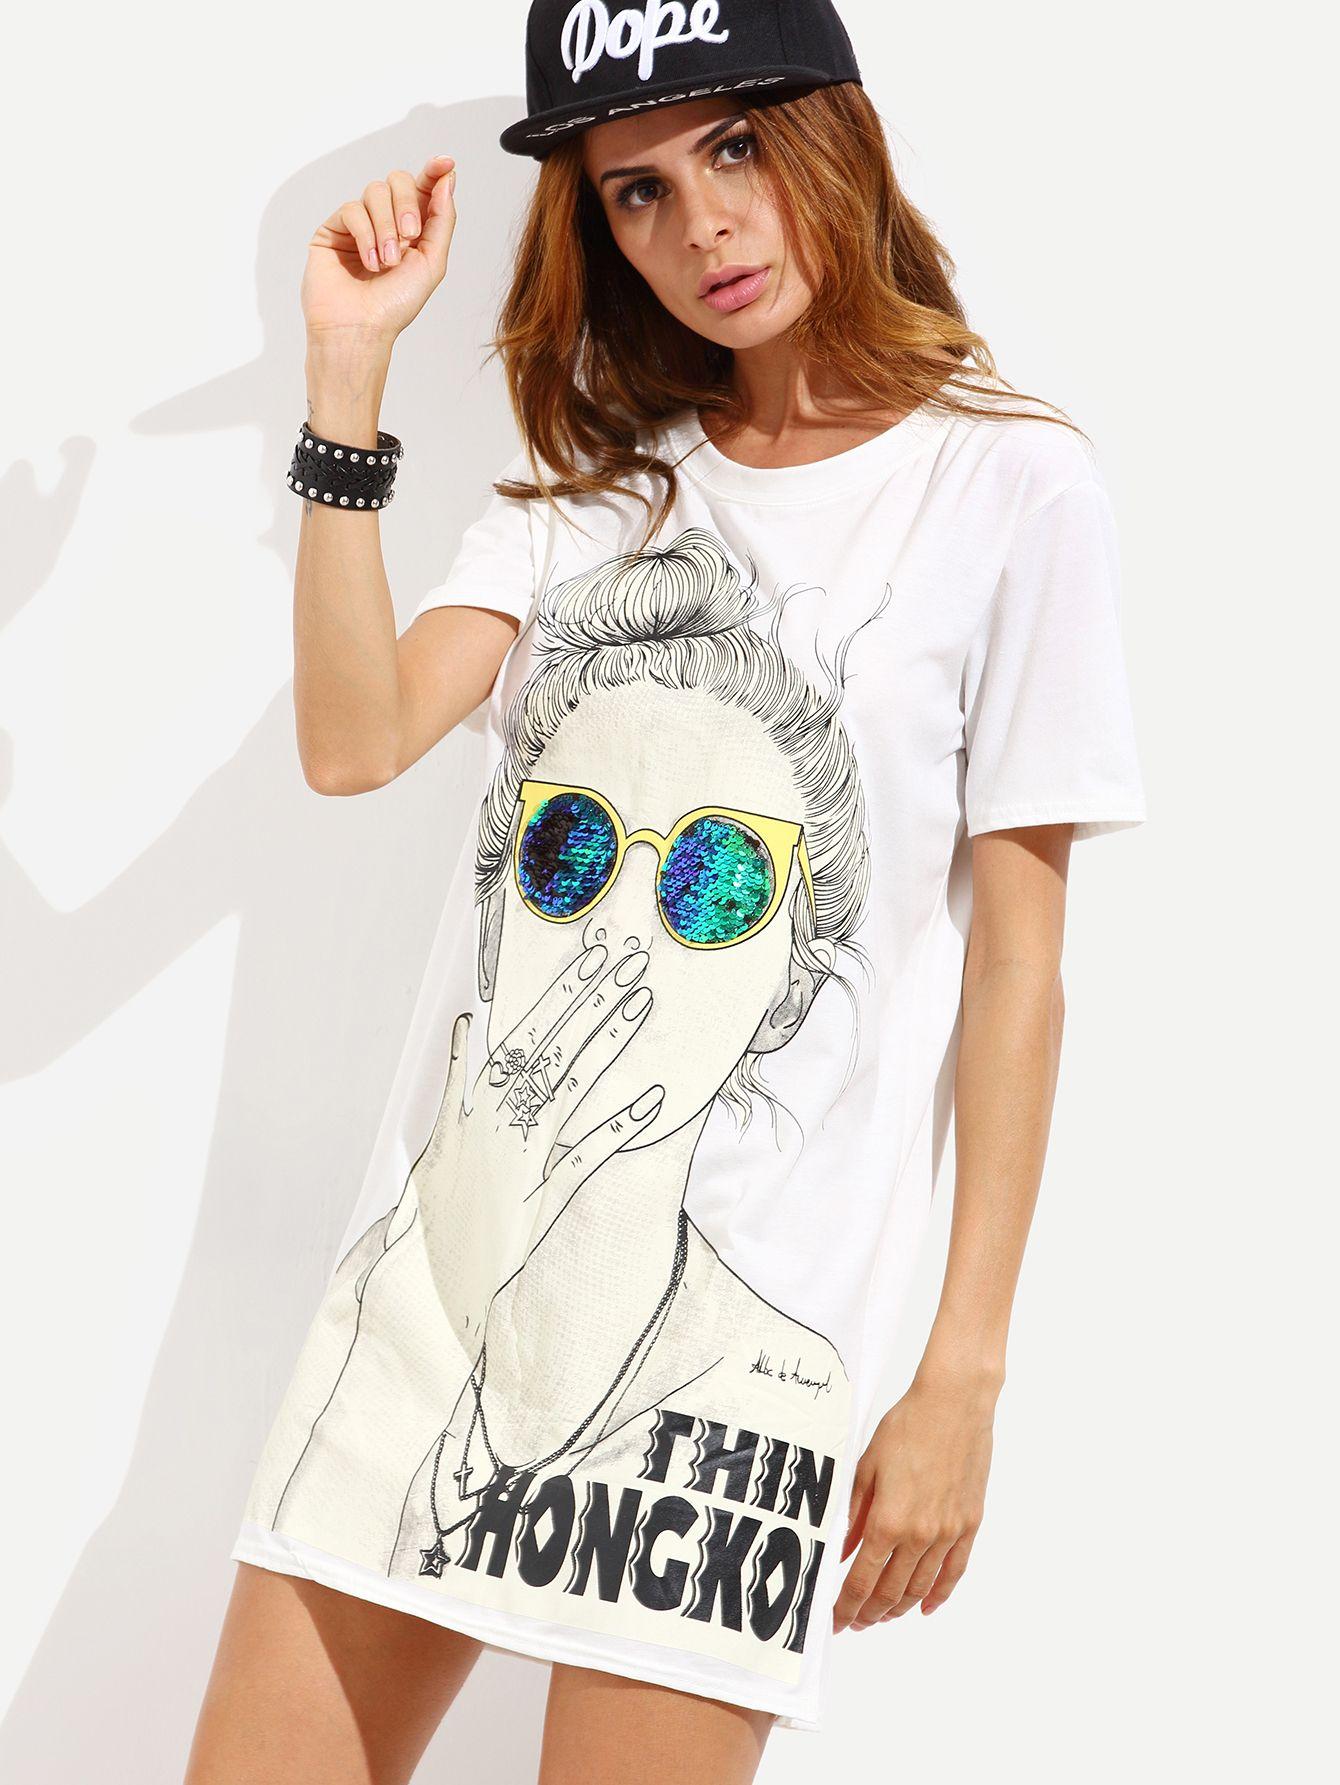 Buy it now. White Cartoon Print Slit Side Tshirt Dress. White Casual Cotton Round Neck Short Sleeve Shift Short Print Fabric has some stretch Summer Tshirt Dresses. , vestidoinformal, casual, camiseta, playeros, informales, túnica, estilocamiseta, camisola, vestidodealgodón, vestidosdealgodón, verano, informal, playa, playero, capa, capas, vestidobabydoll, camisole, túnica, shift, pleat, pleated, drape, t-shape, daisy, foldedshoulder, summer, loosefit, tunictop, swing, day, offtheshoulder...